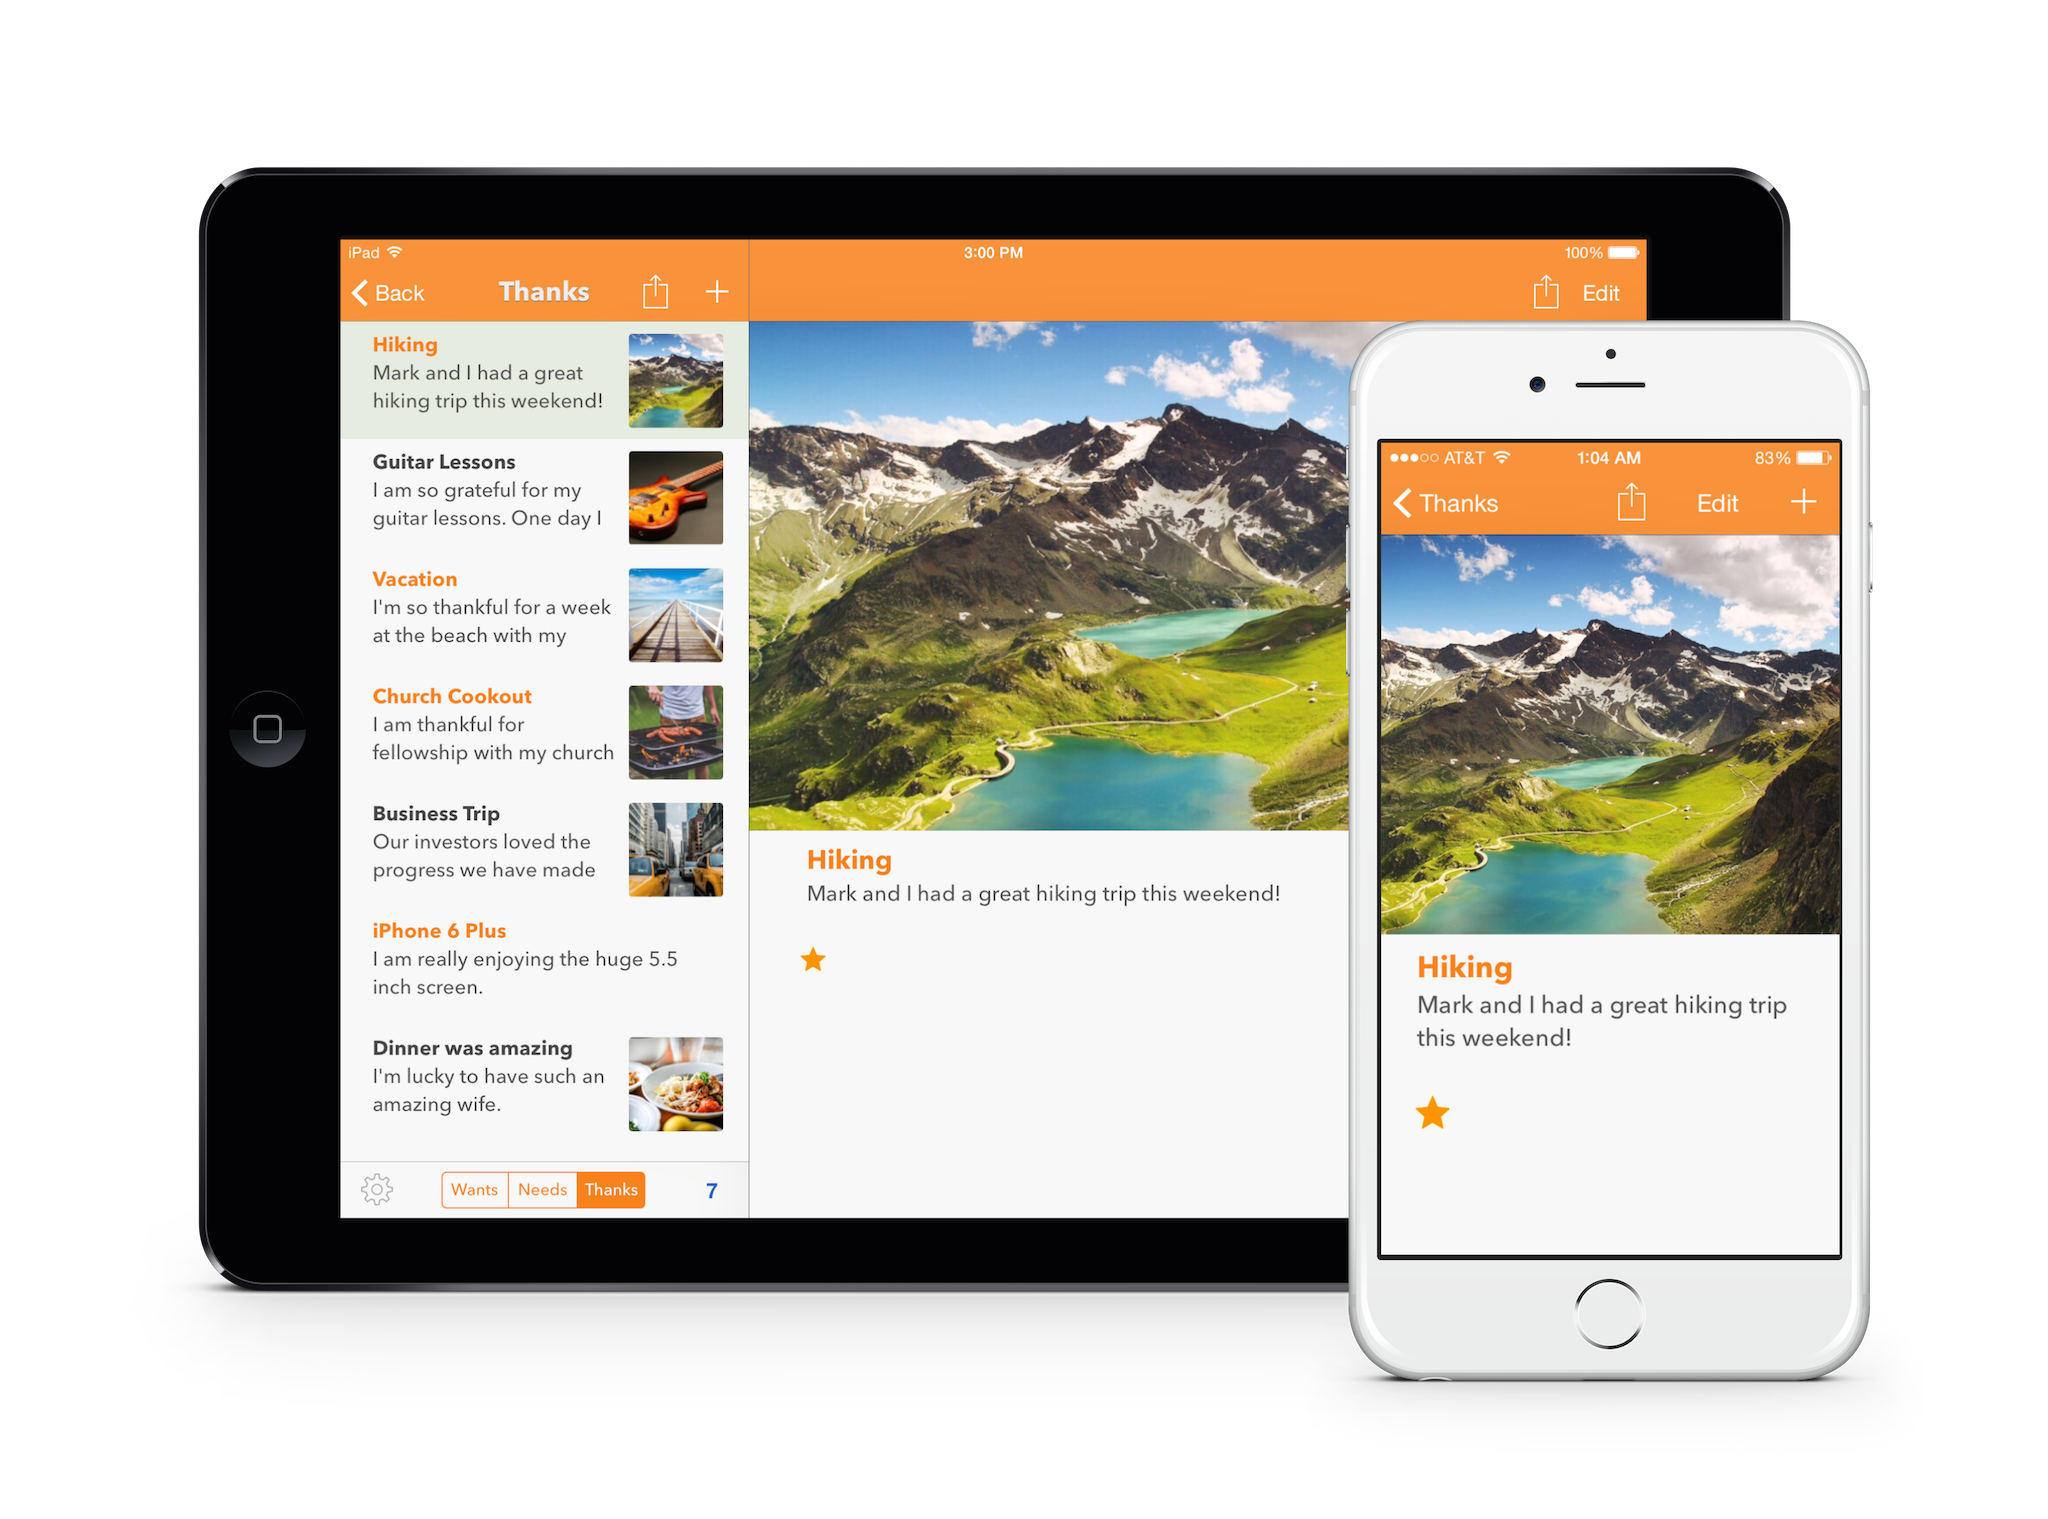 http://wantsandneedsapp.com/wp-content/uploads/2015/01/Wants-and-Needs-iPad-iPhone-Sync-Hiking-New-copy.png